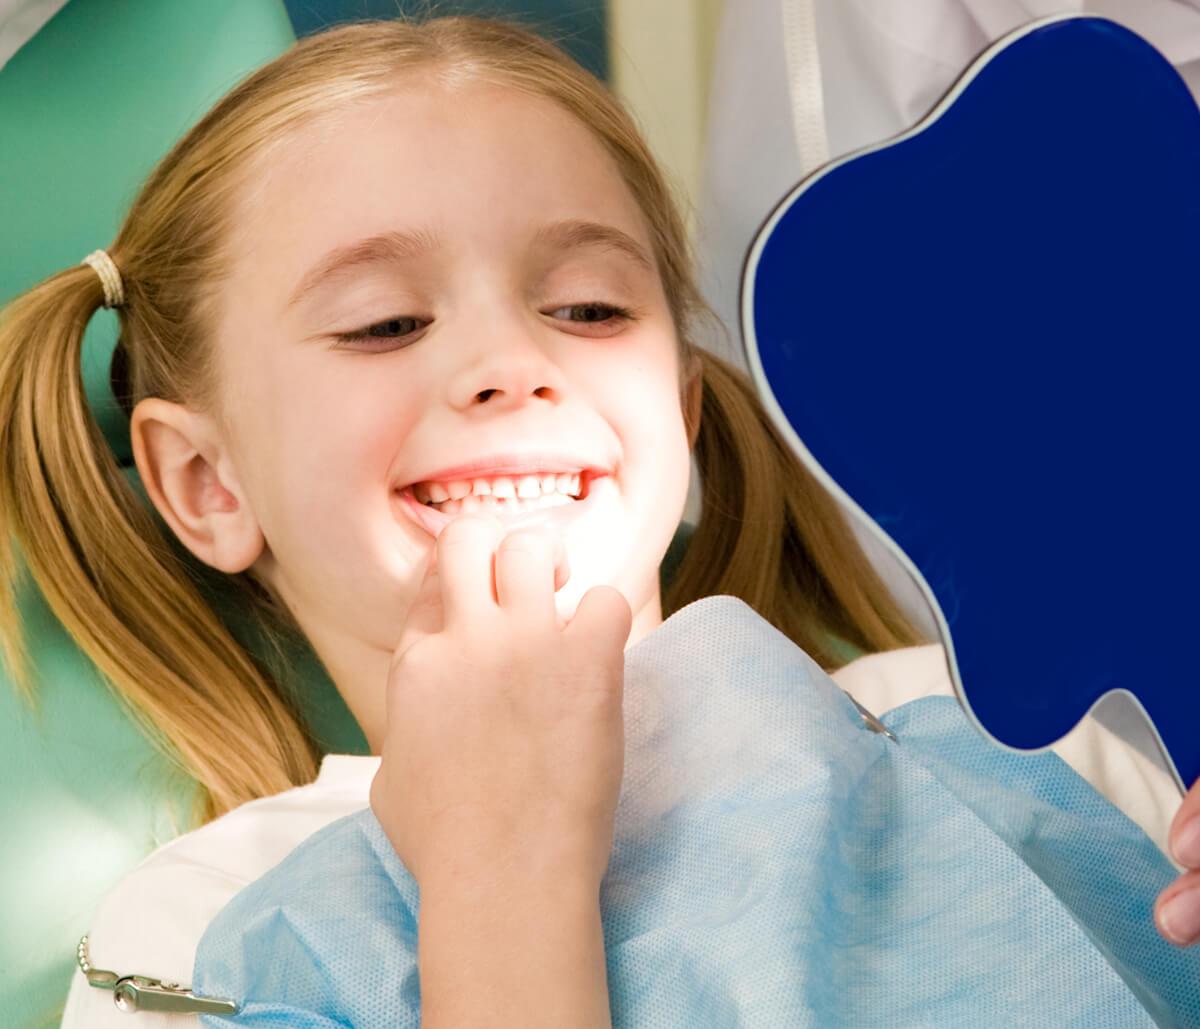 Qualified Medicaid Dentist Near Me Fort Worth TX Area